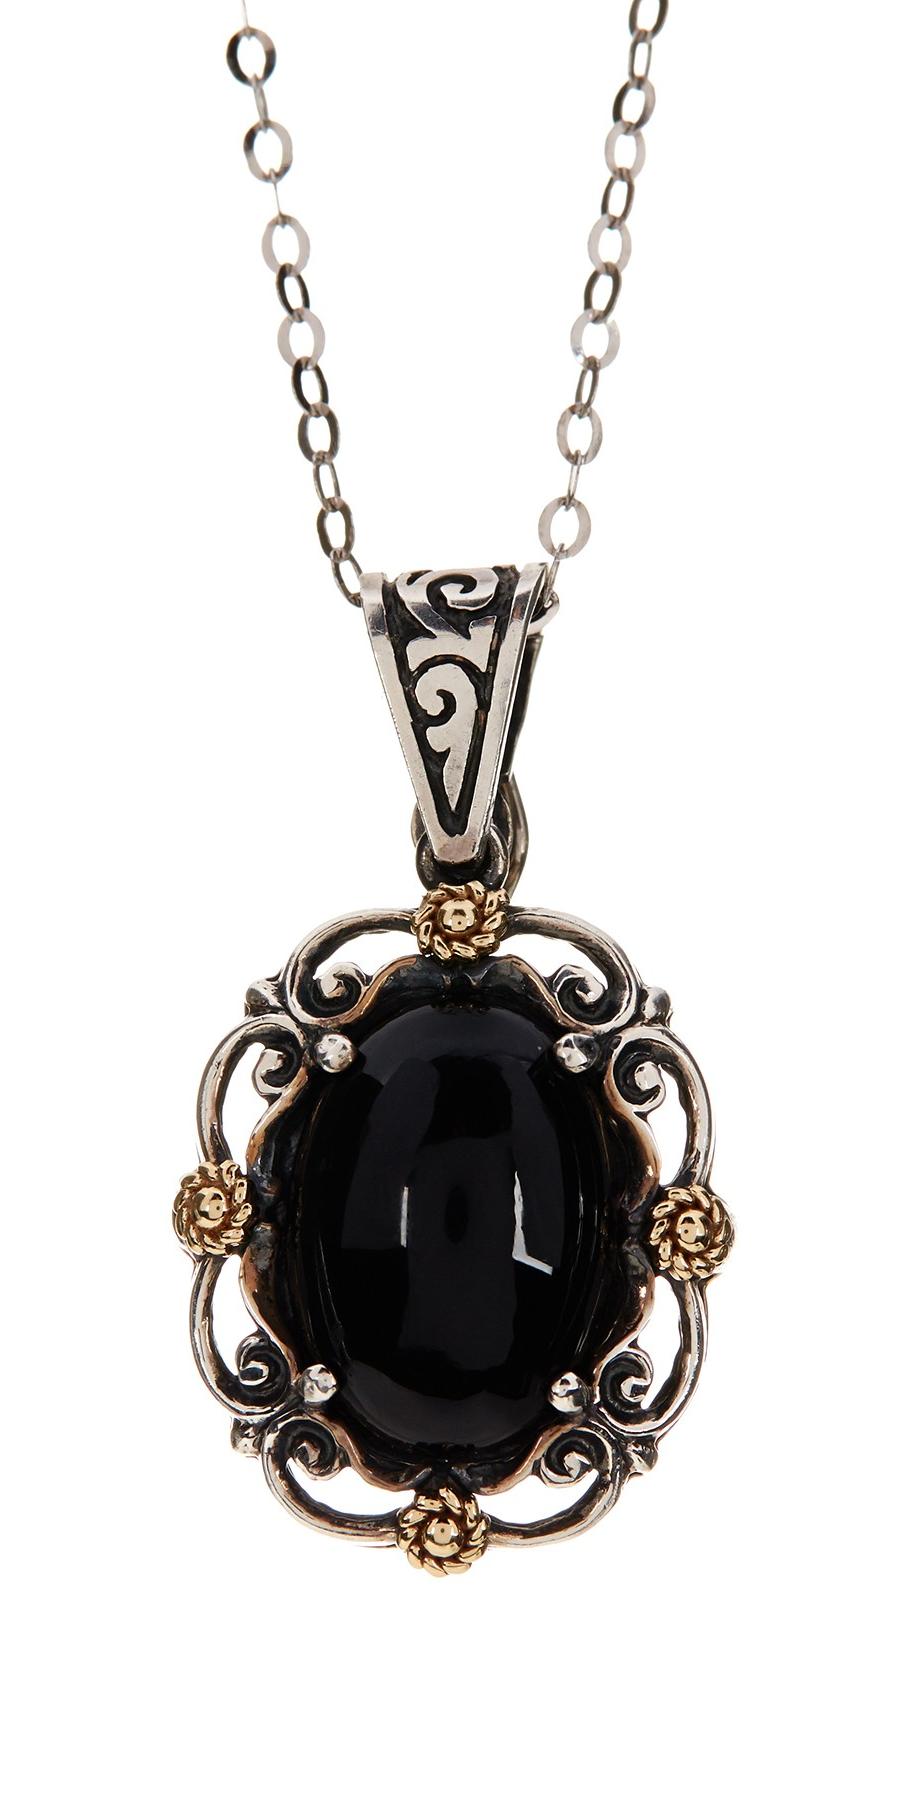 Dani G Jewelry 14K Gold & Sterling Silver Black Onyx Pendant Necklace